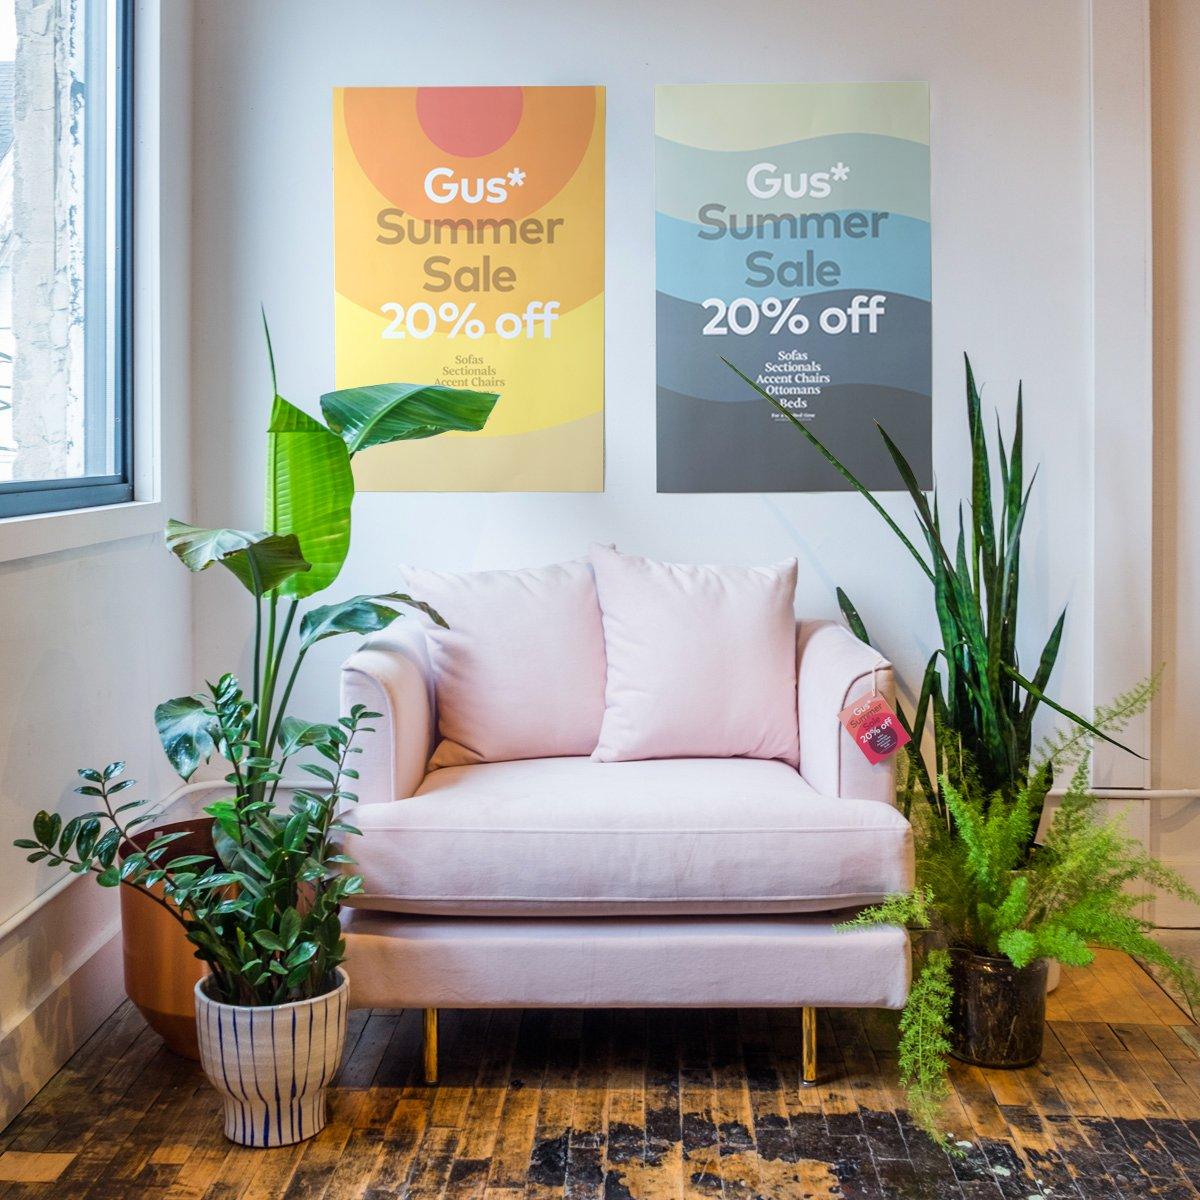 Miraculous Gus Modern Gusmodern Twitter Home Interior And Landscaping Transignezvosmurscom